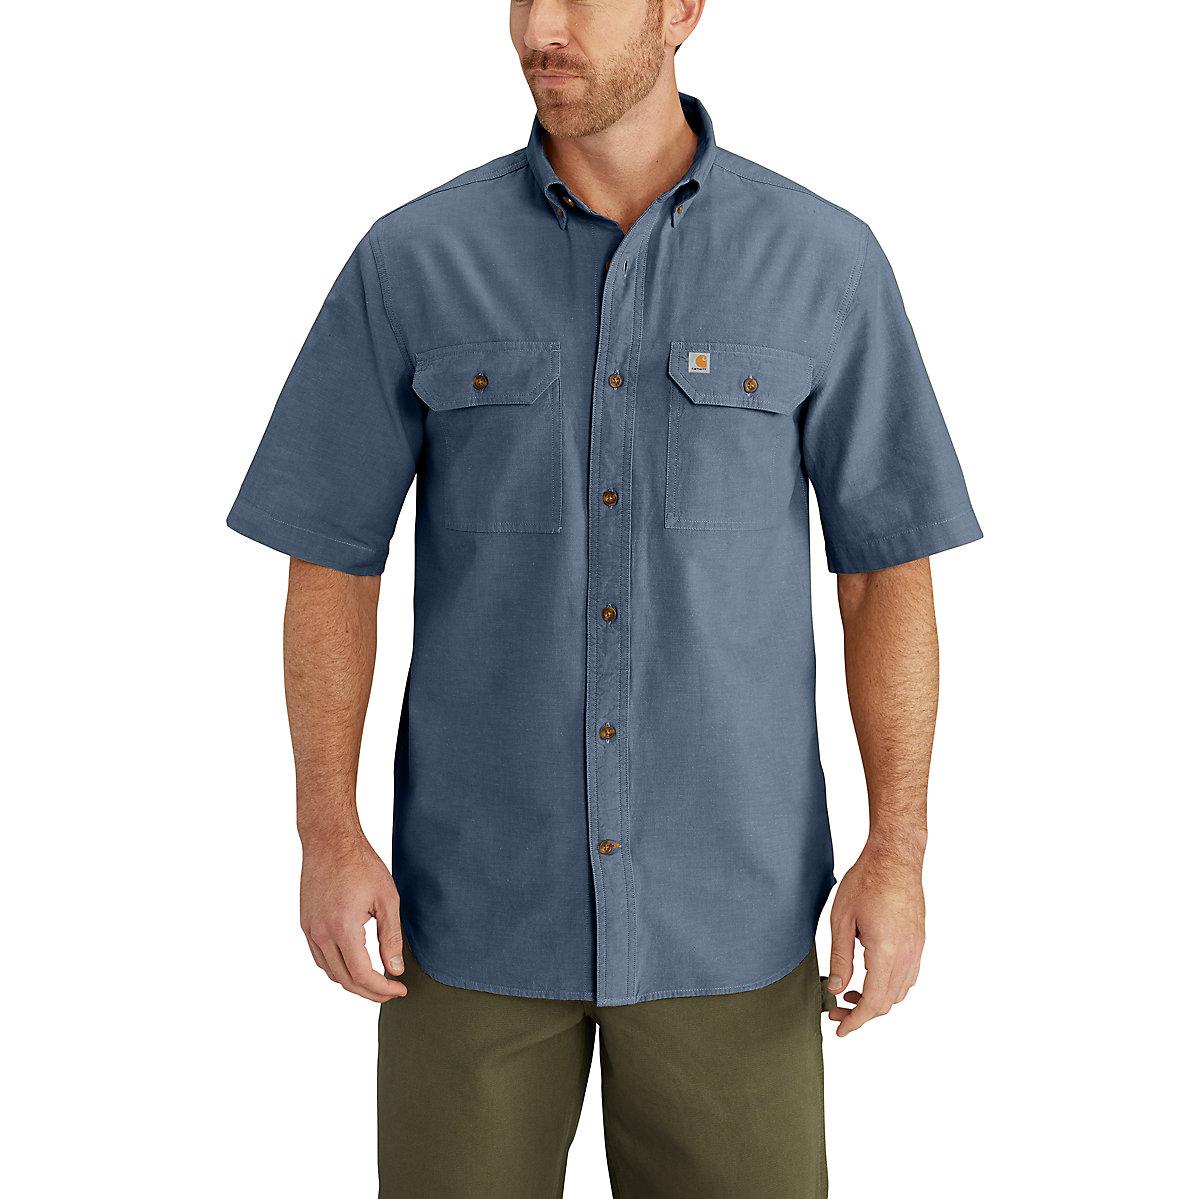 Men 39 s short sleeve chambray shirt s200 carhartt for Chambray shirt for kids